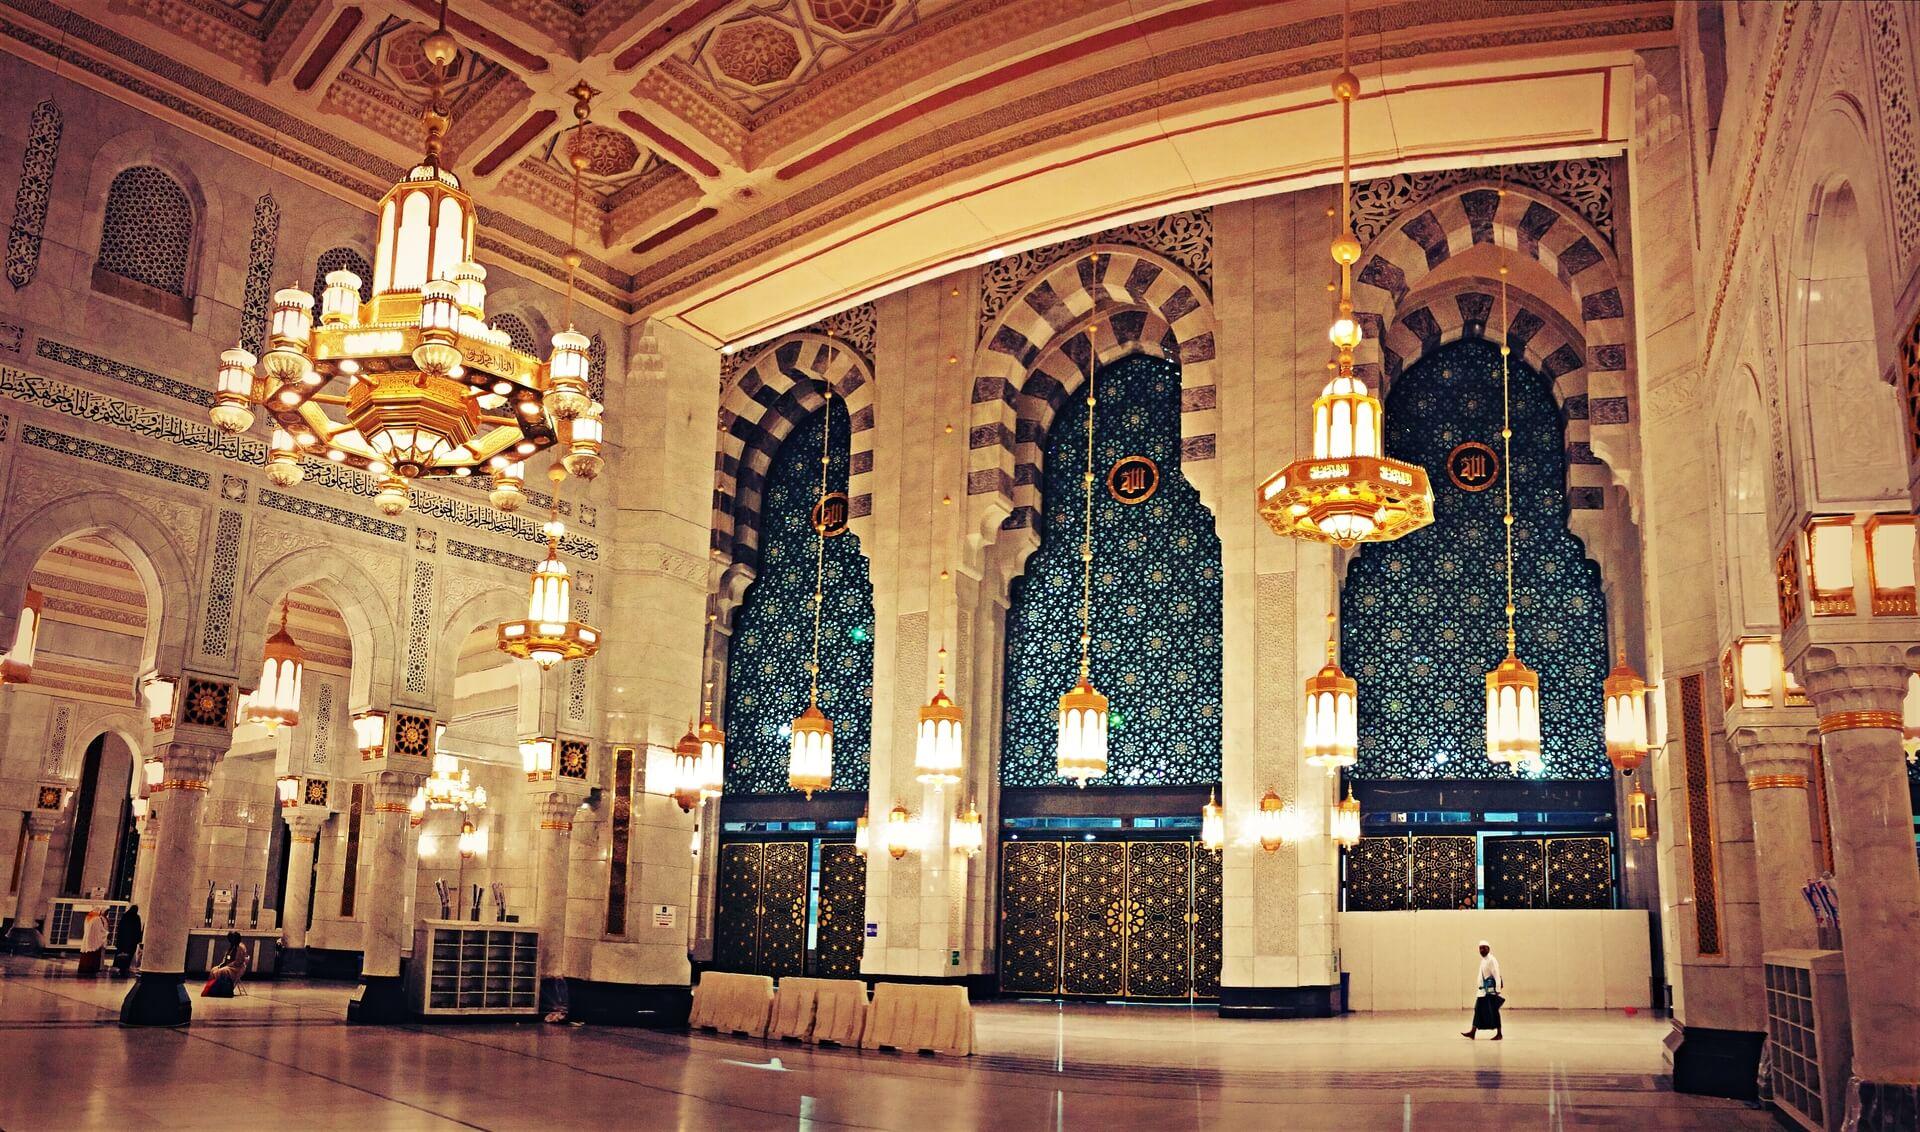 Grand Mosque, Mecca, Saudi Arabia